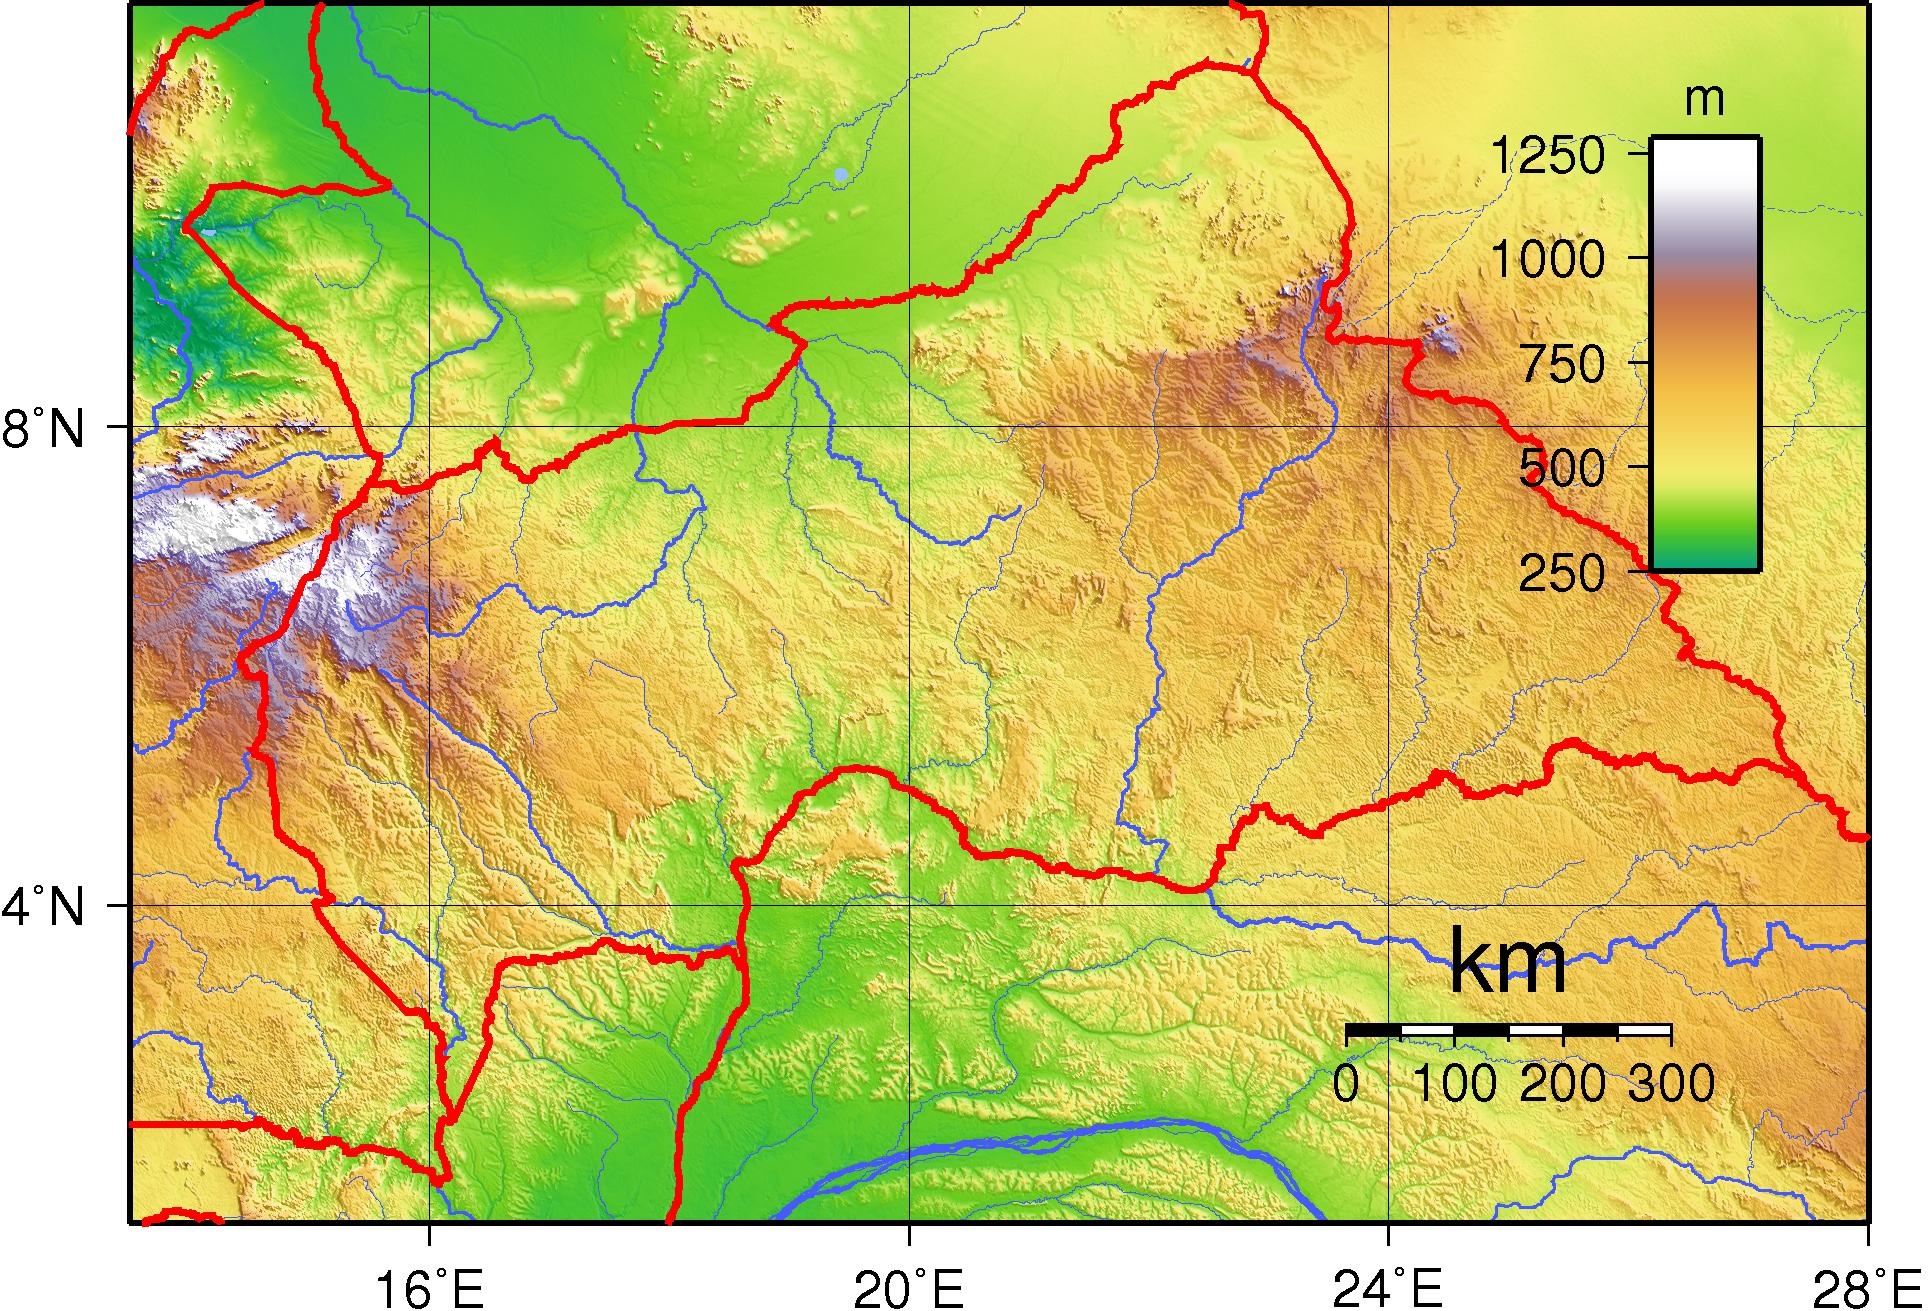 Vaizdas Central African Republic Topography Png Vikipedija